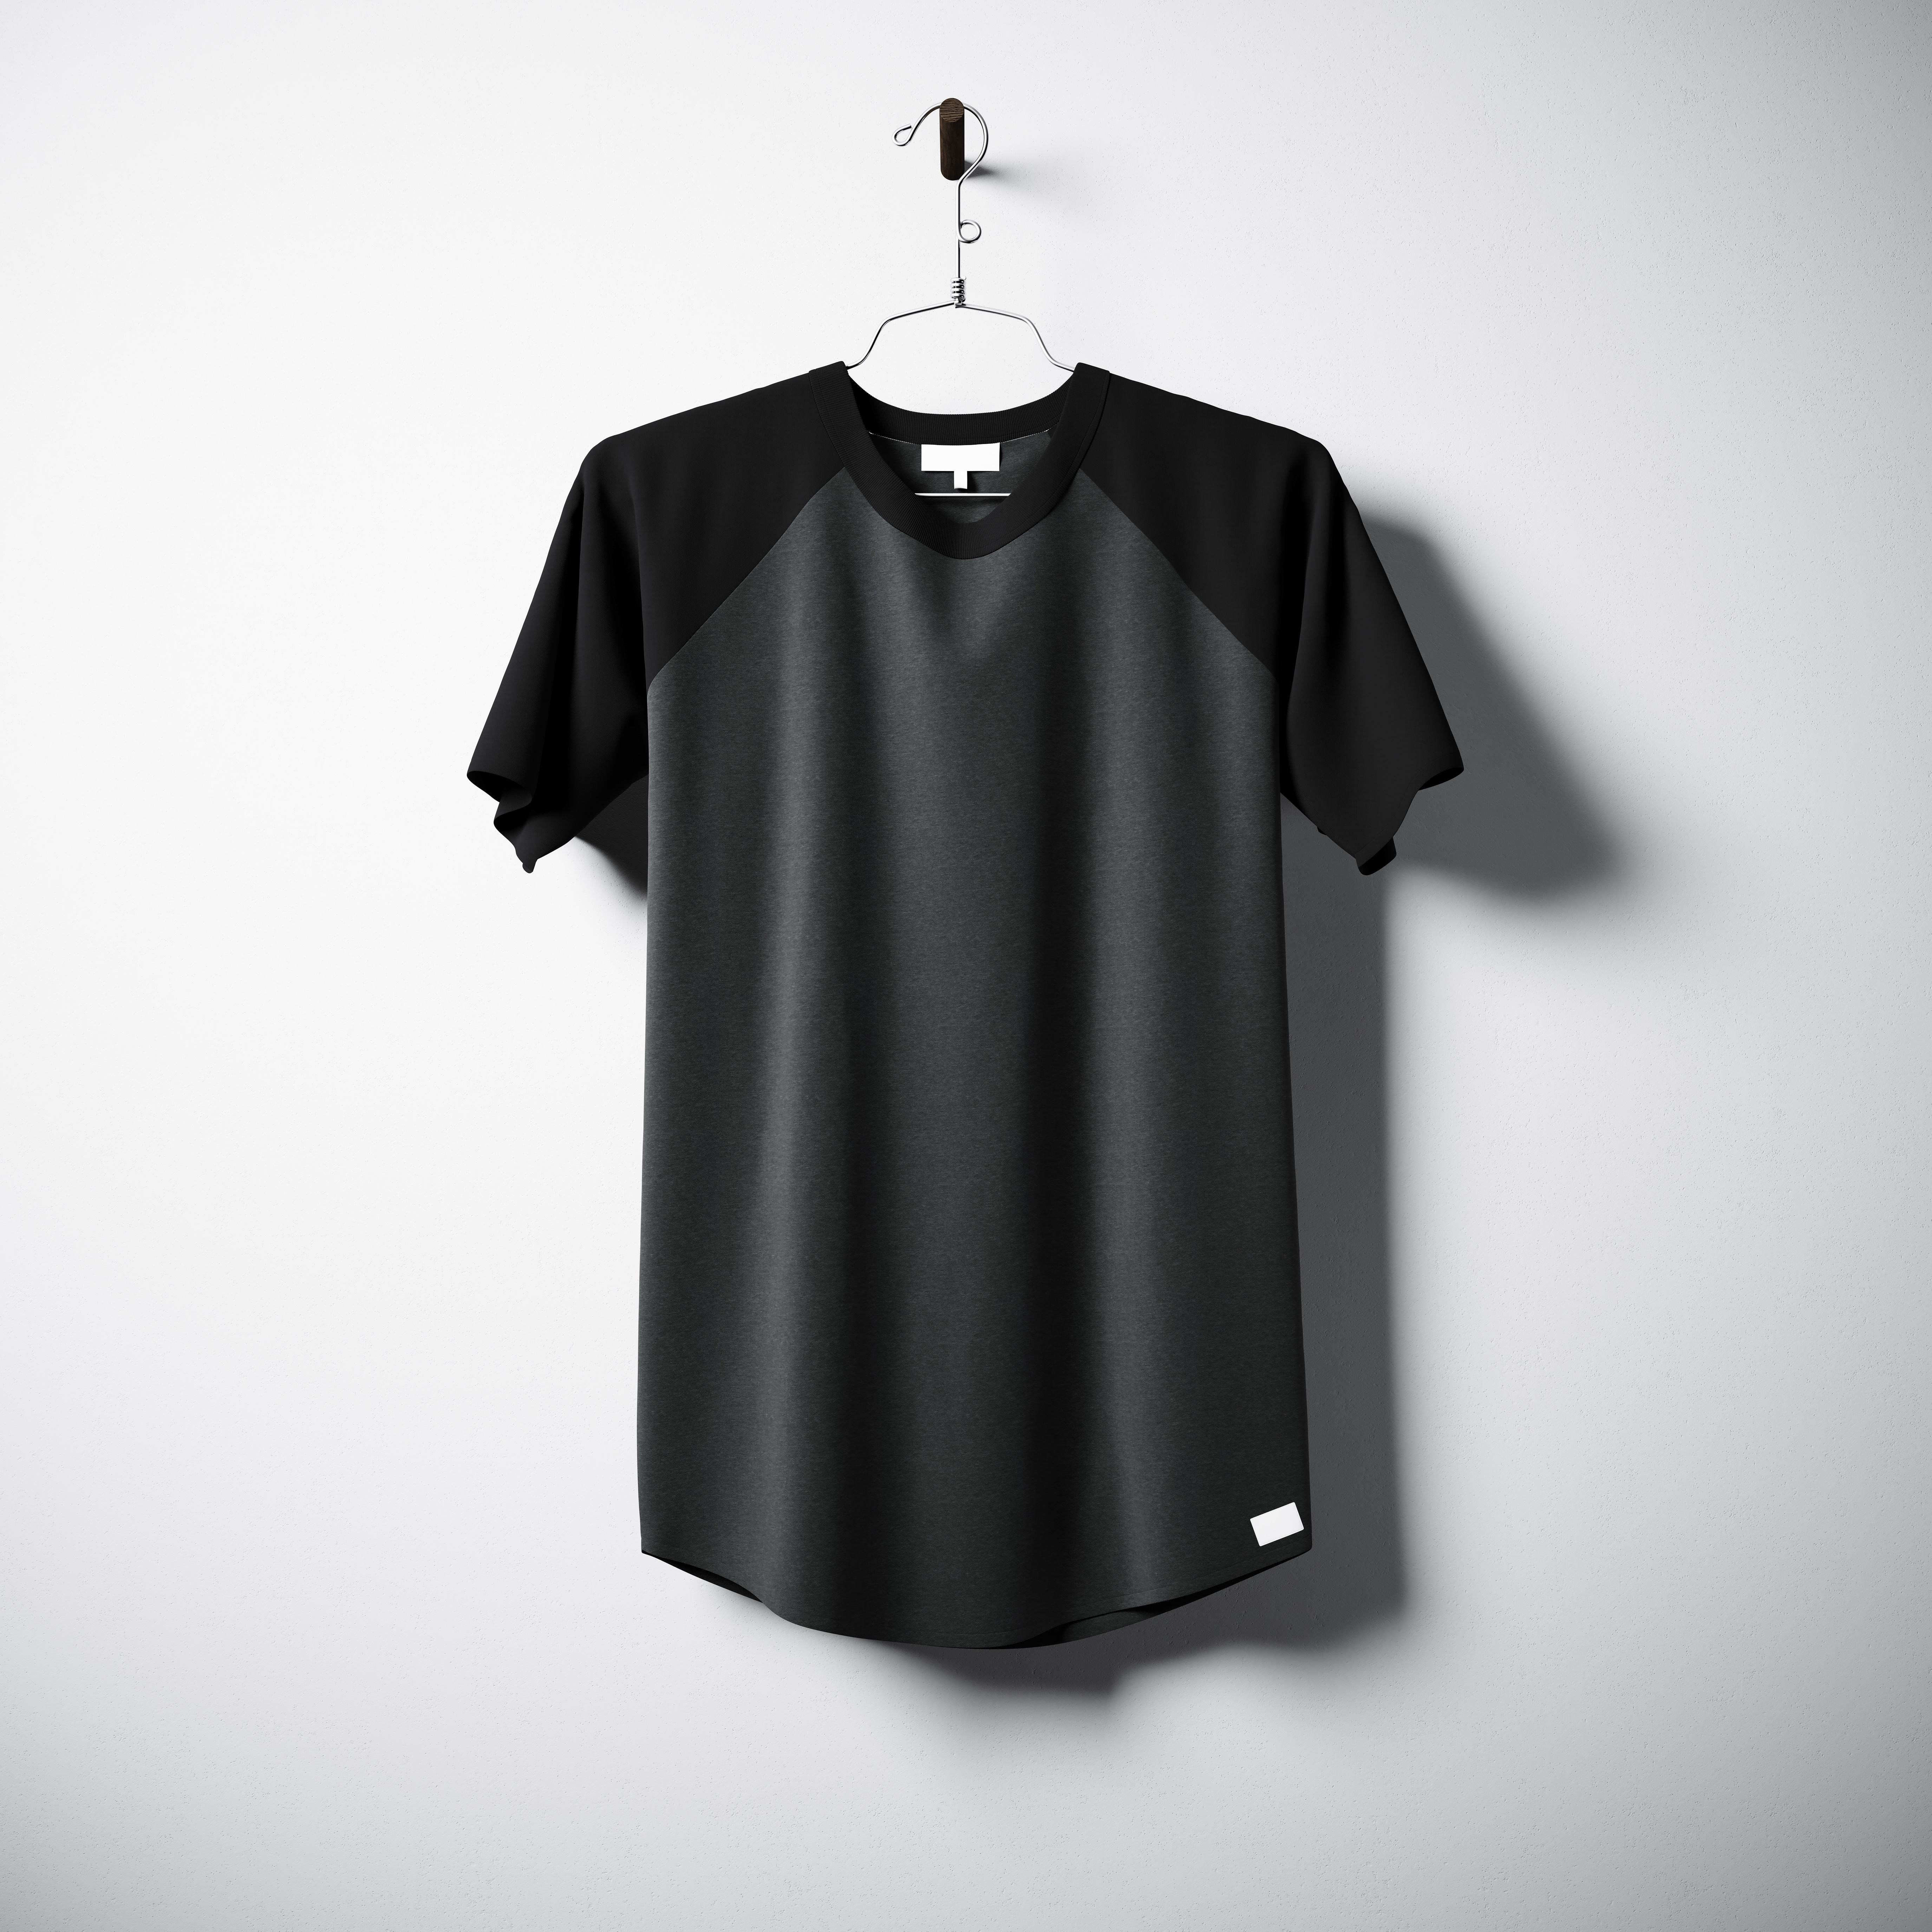 Custom made T-Shirts (16)